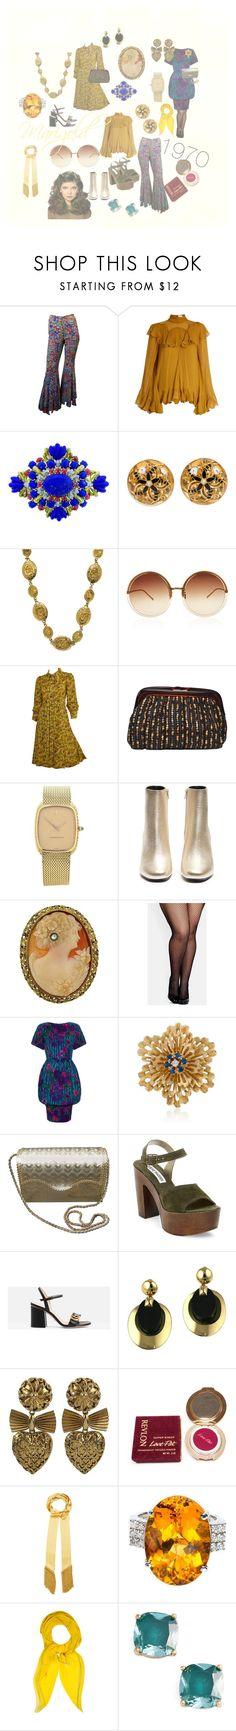 """1970s fashion"" by bren-fashun on Polyvore featuring Chloé, Lazuli, Chanel, Linda Farrow, Audemars Piguet, Yves Saint Laurent, City Chic, Ross-Simons, Saks Fifth Avenue and Steve Madden"